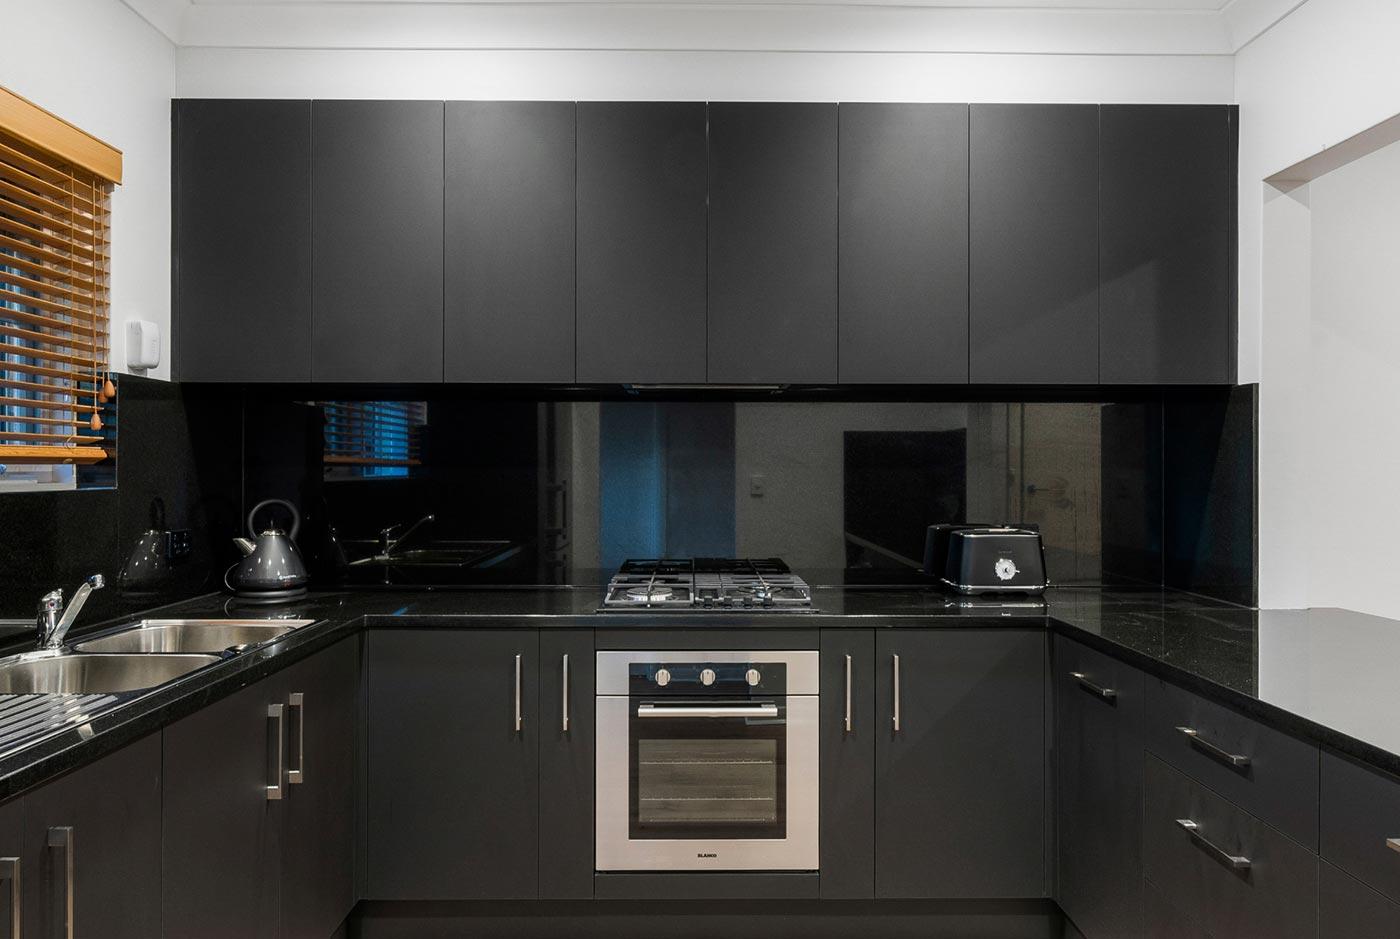 home kitchen renovations image